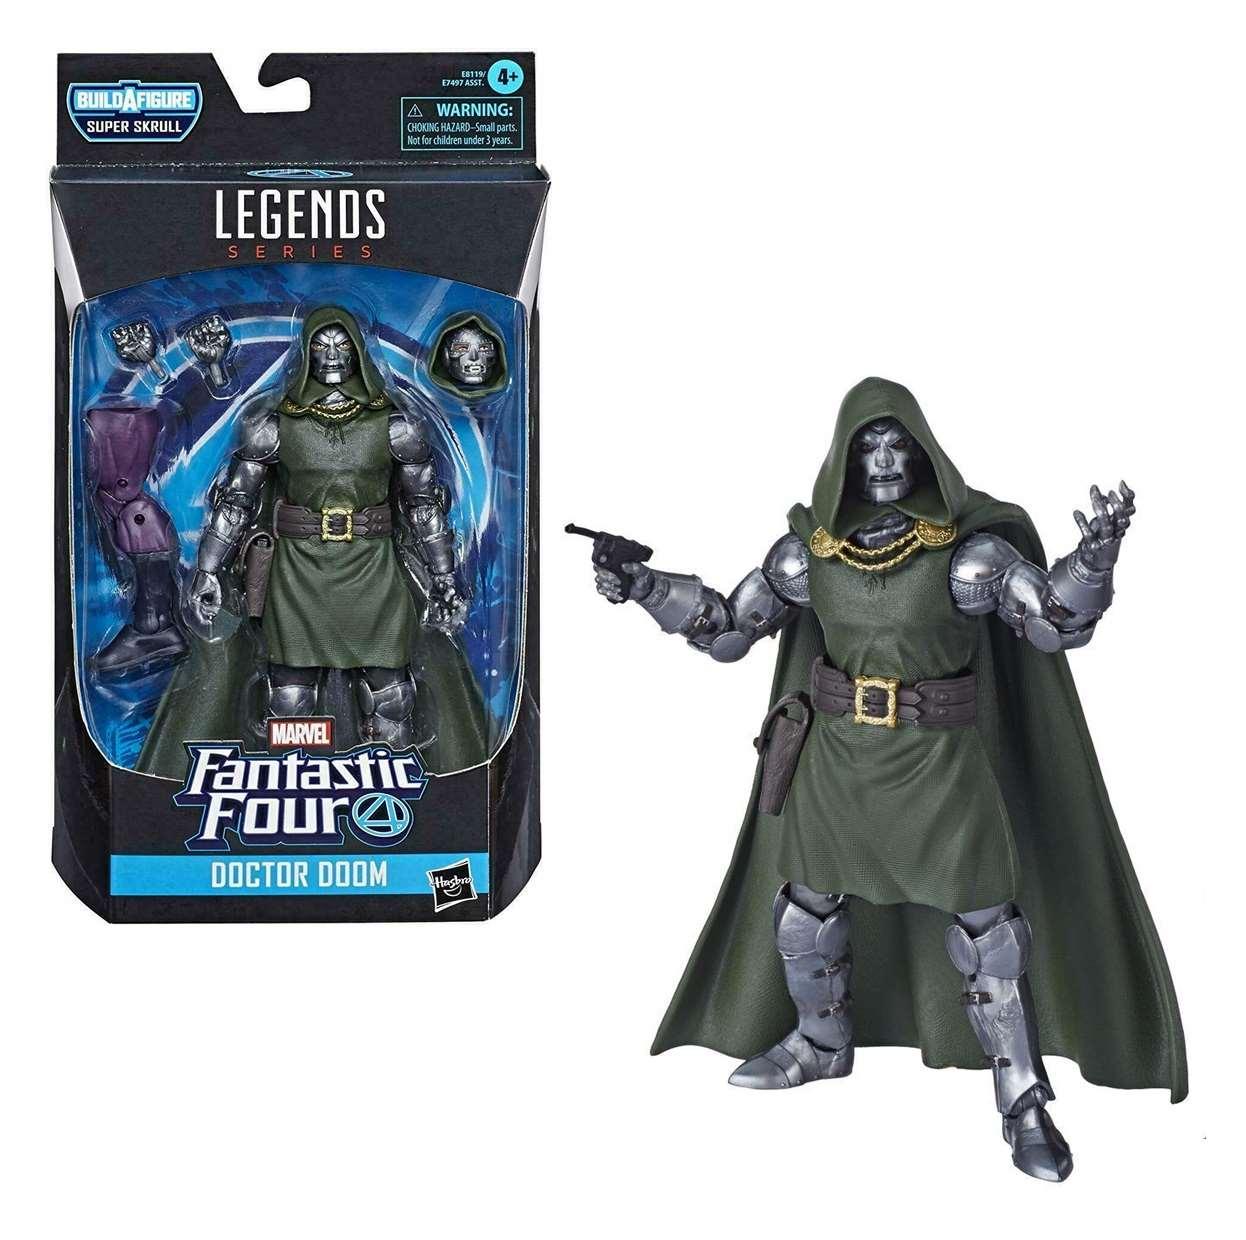 Doctor Doom Figura Fantastic Four B A F Super Skrull Legends